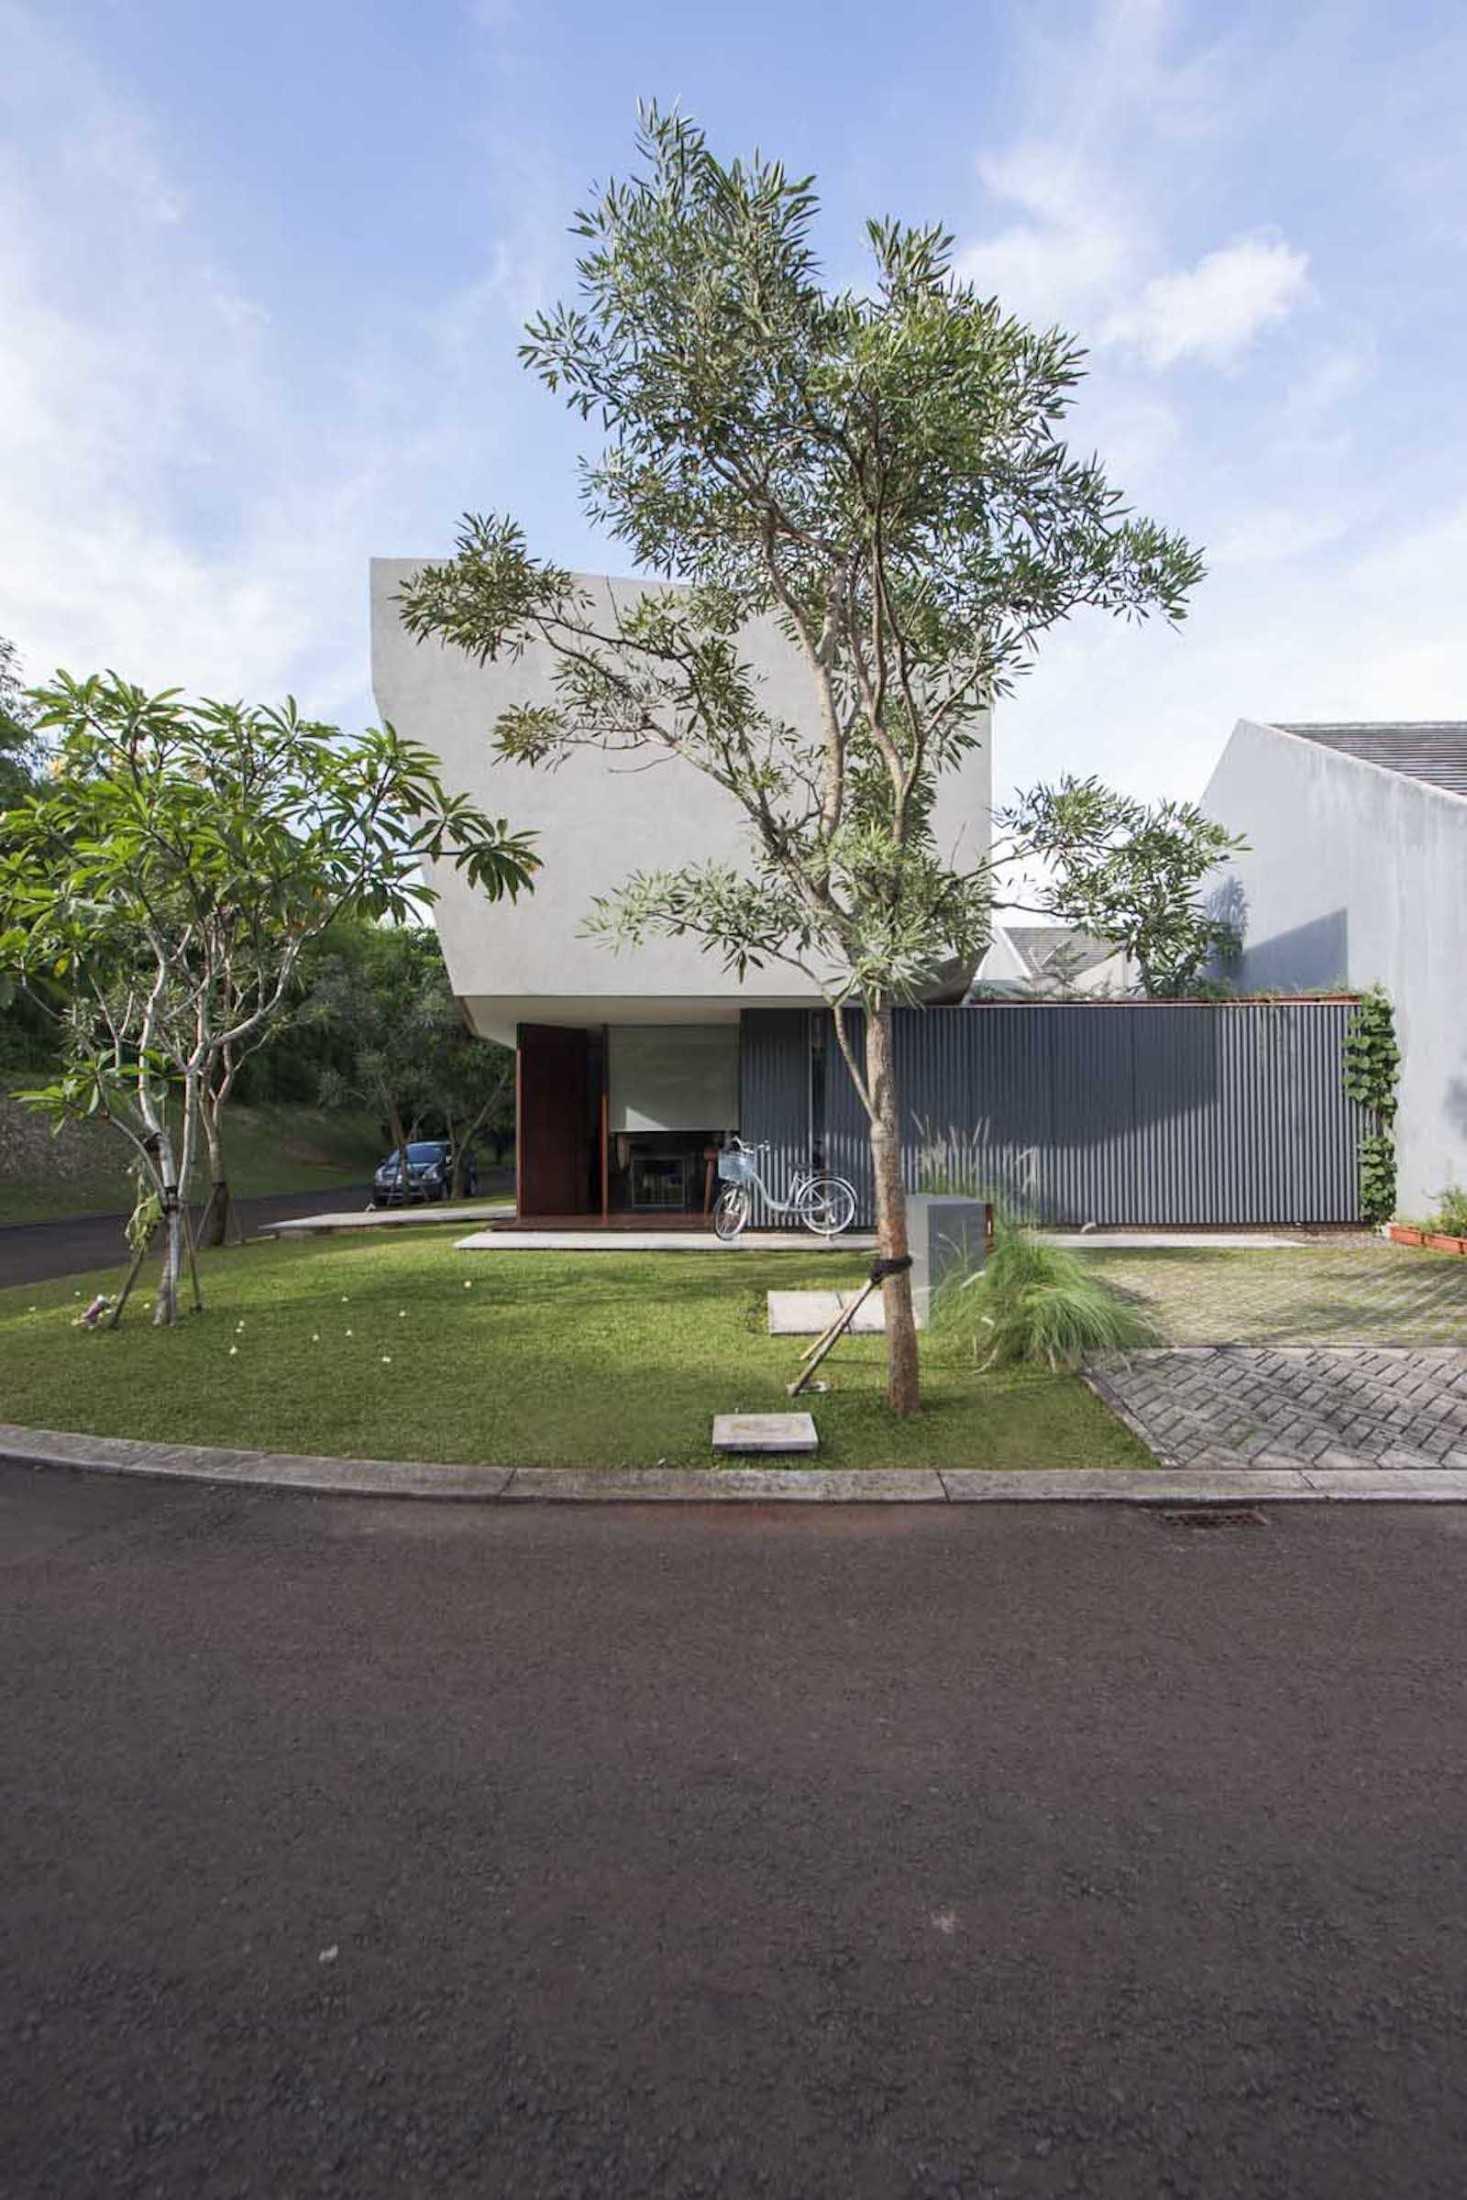 Armschitecture House Of Trimmed Reform Tangerang, Kota Tangerang, Banten, Indonesia Tangerang, Kota Tangerang, Banten, Indonesia Arms-Studio-House-Of-Trimmed-Reform Contemporary 65848